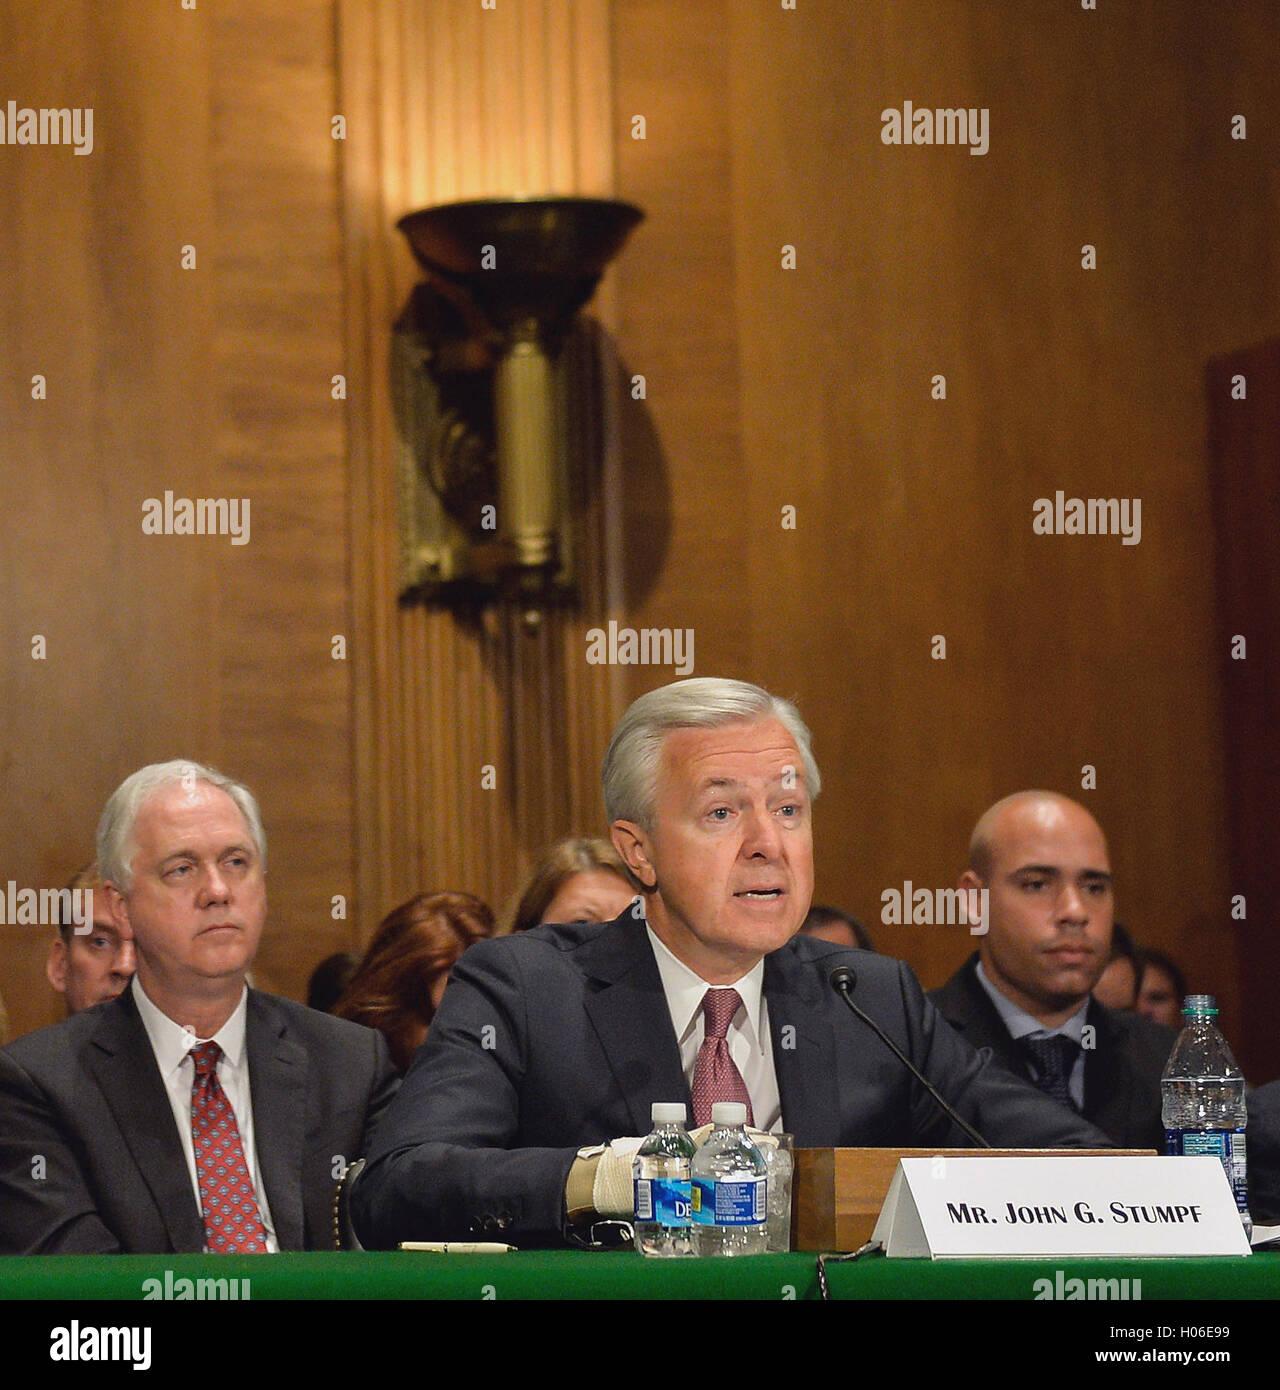 Washington, DC, USA. 20th Sep, 2016. Wells Fargo's chairman and chief executive officer (CEO) John Stumpf testifies Stock Photo